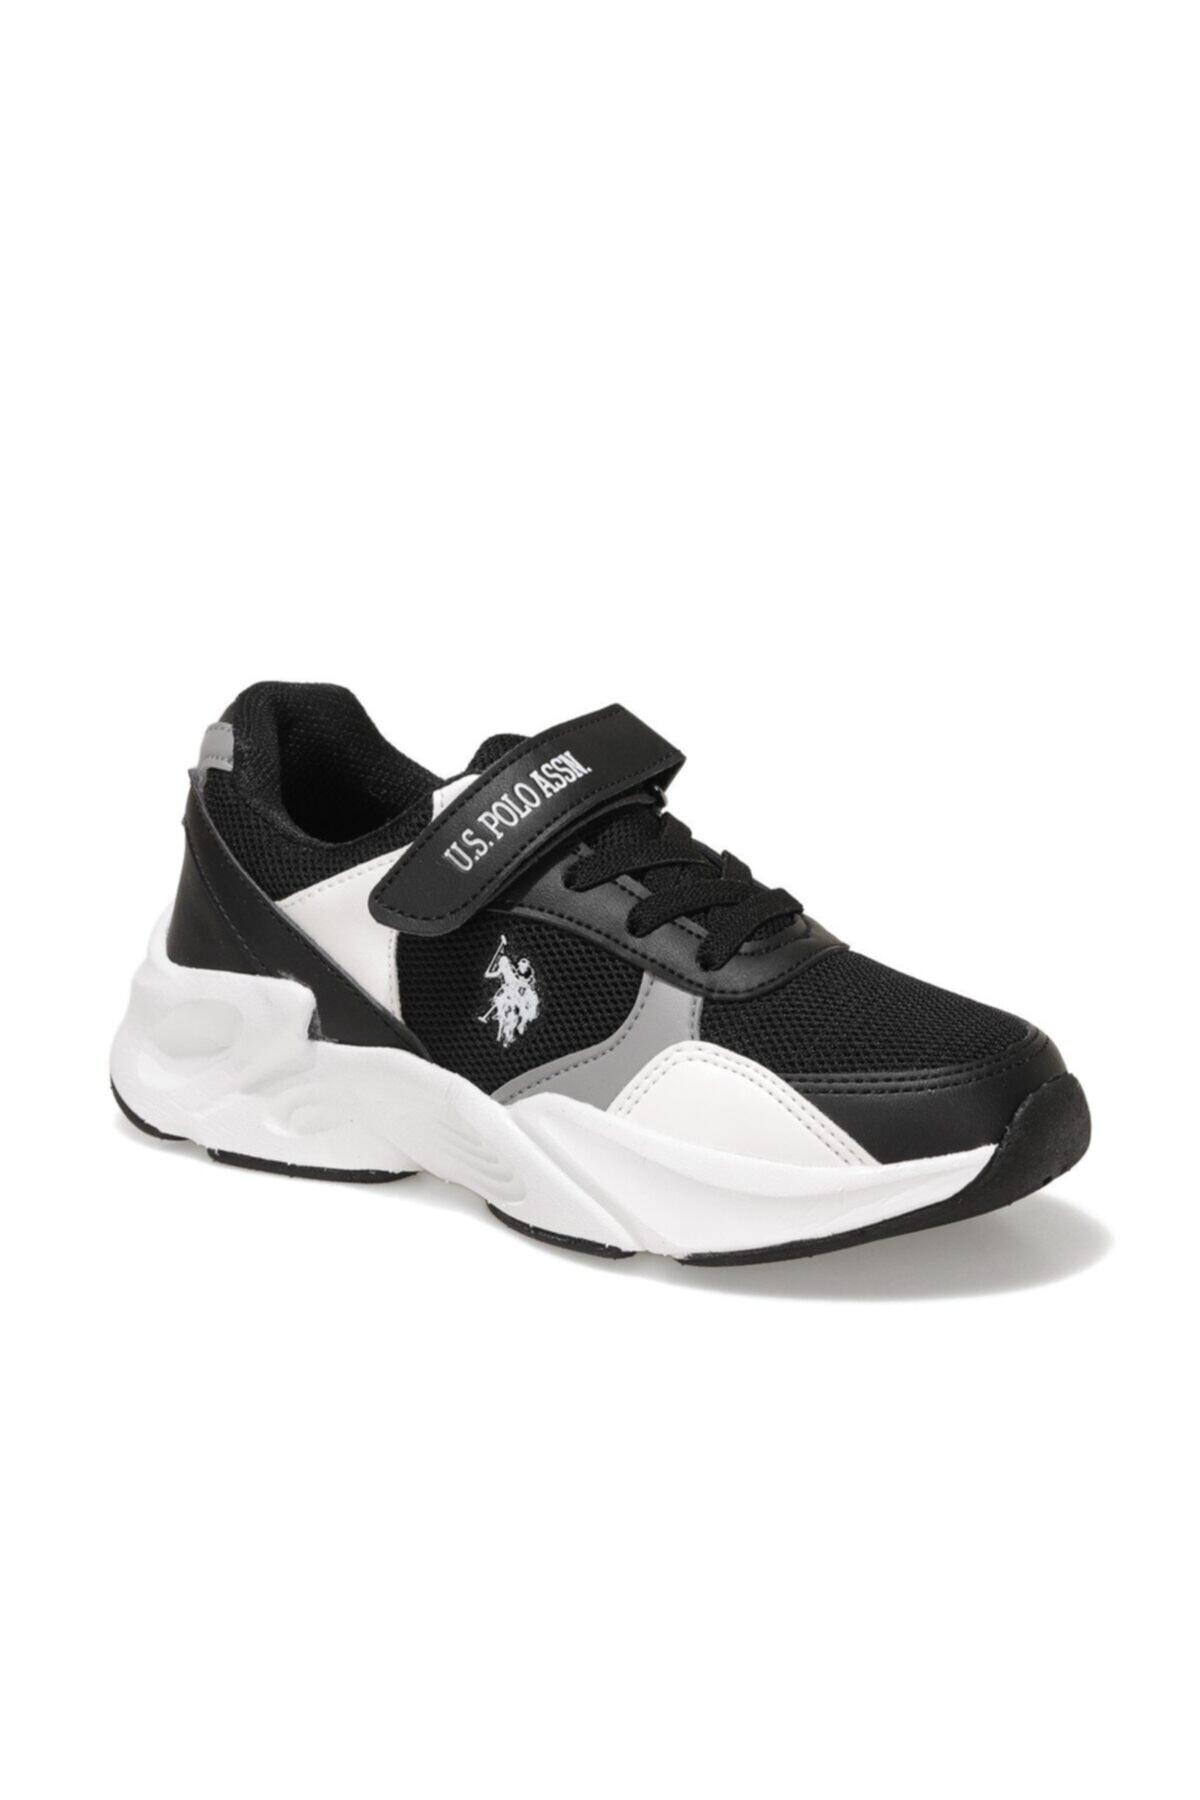 کفش اسپرت بچه گانه پسرانه اینترنتی برند U.S. Polo Assn. رنگ مشکی کد ty94689477